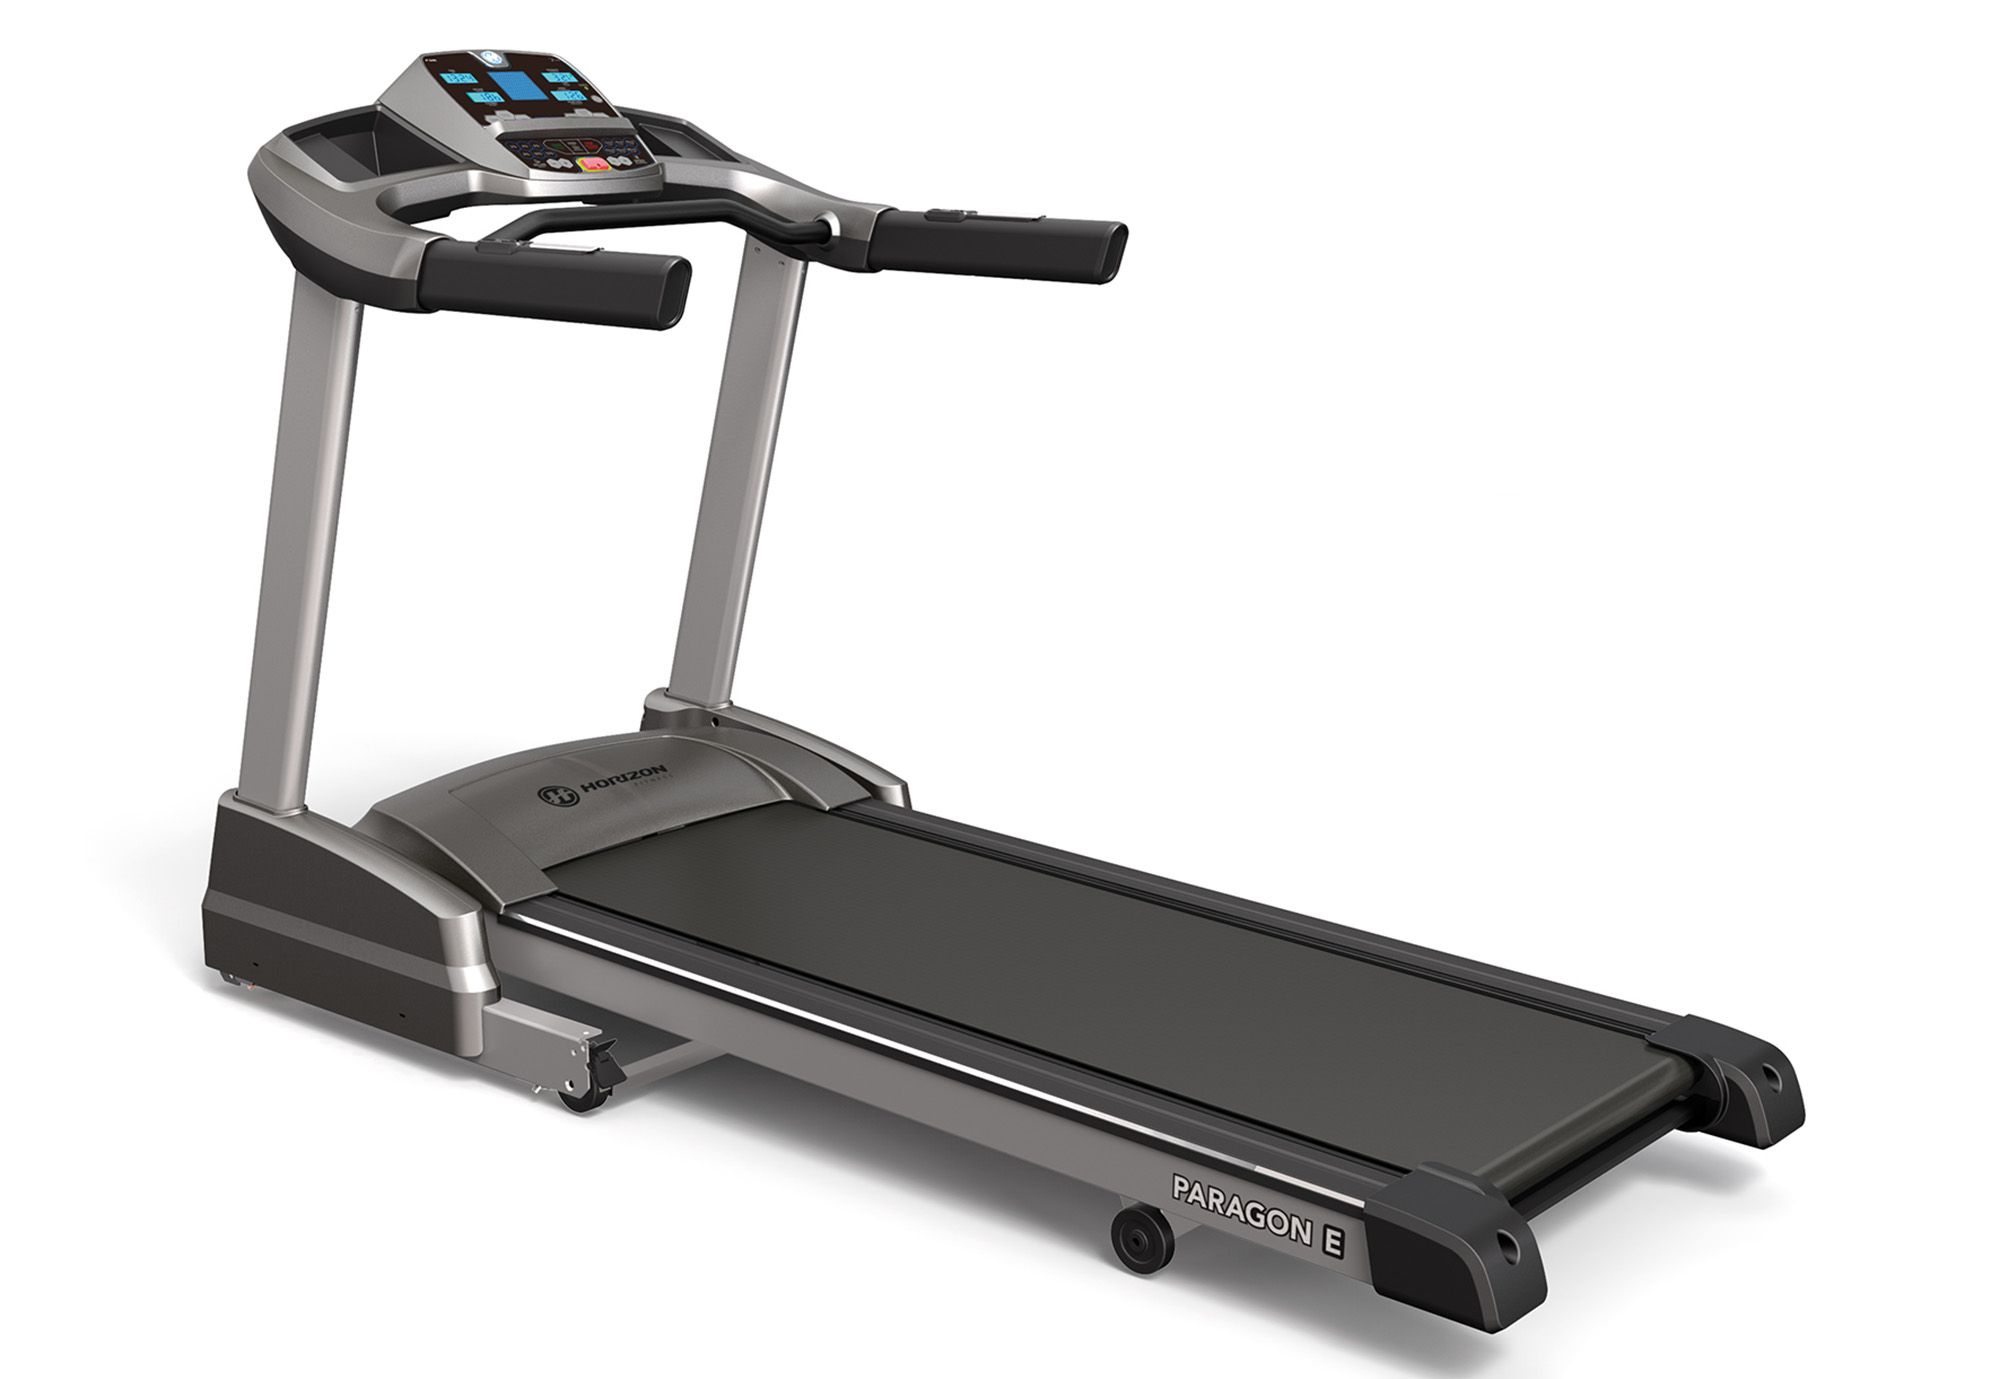 HORIZON FITNESS Laufband, »Paragon 8E«, Horizon Fitness